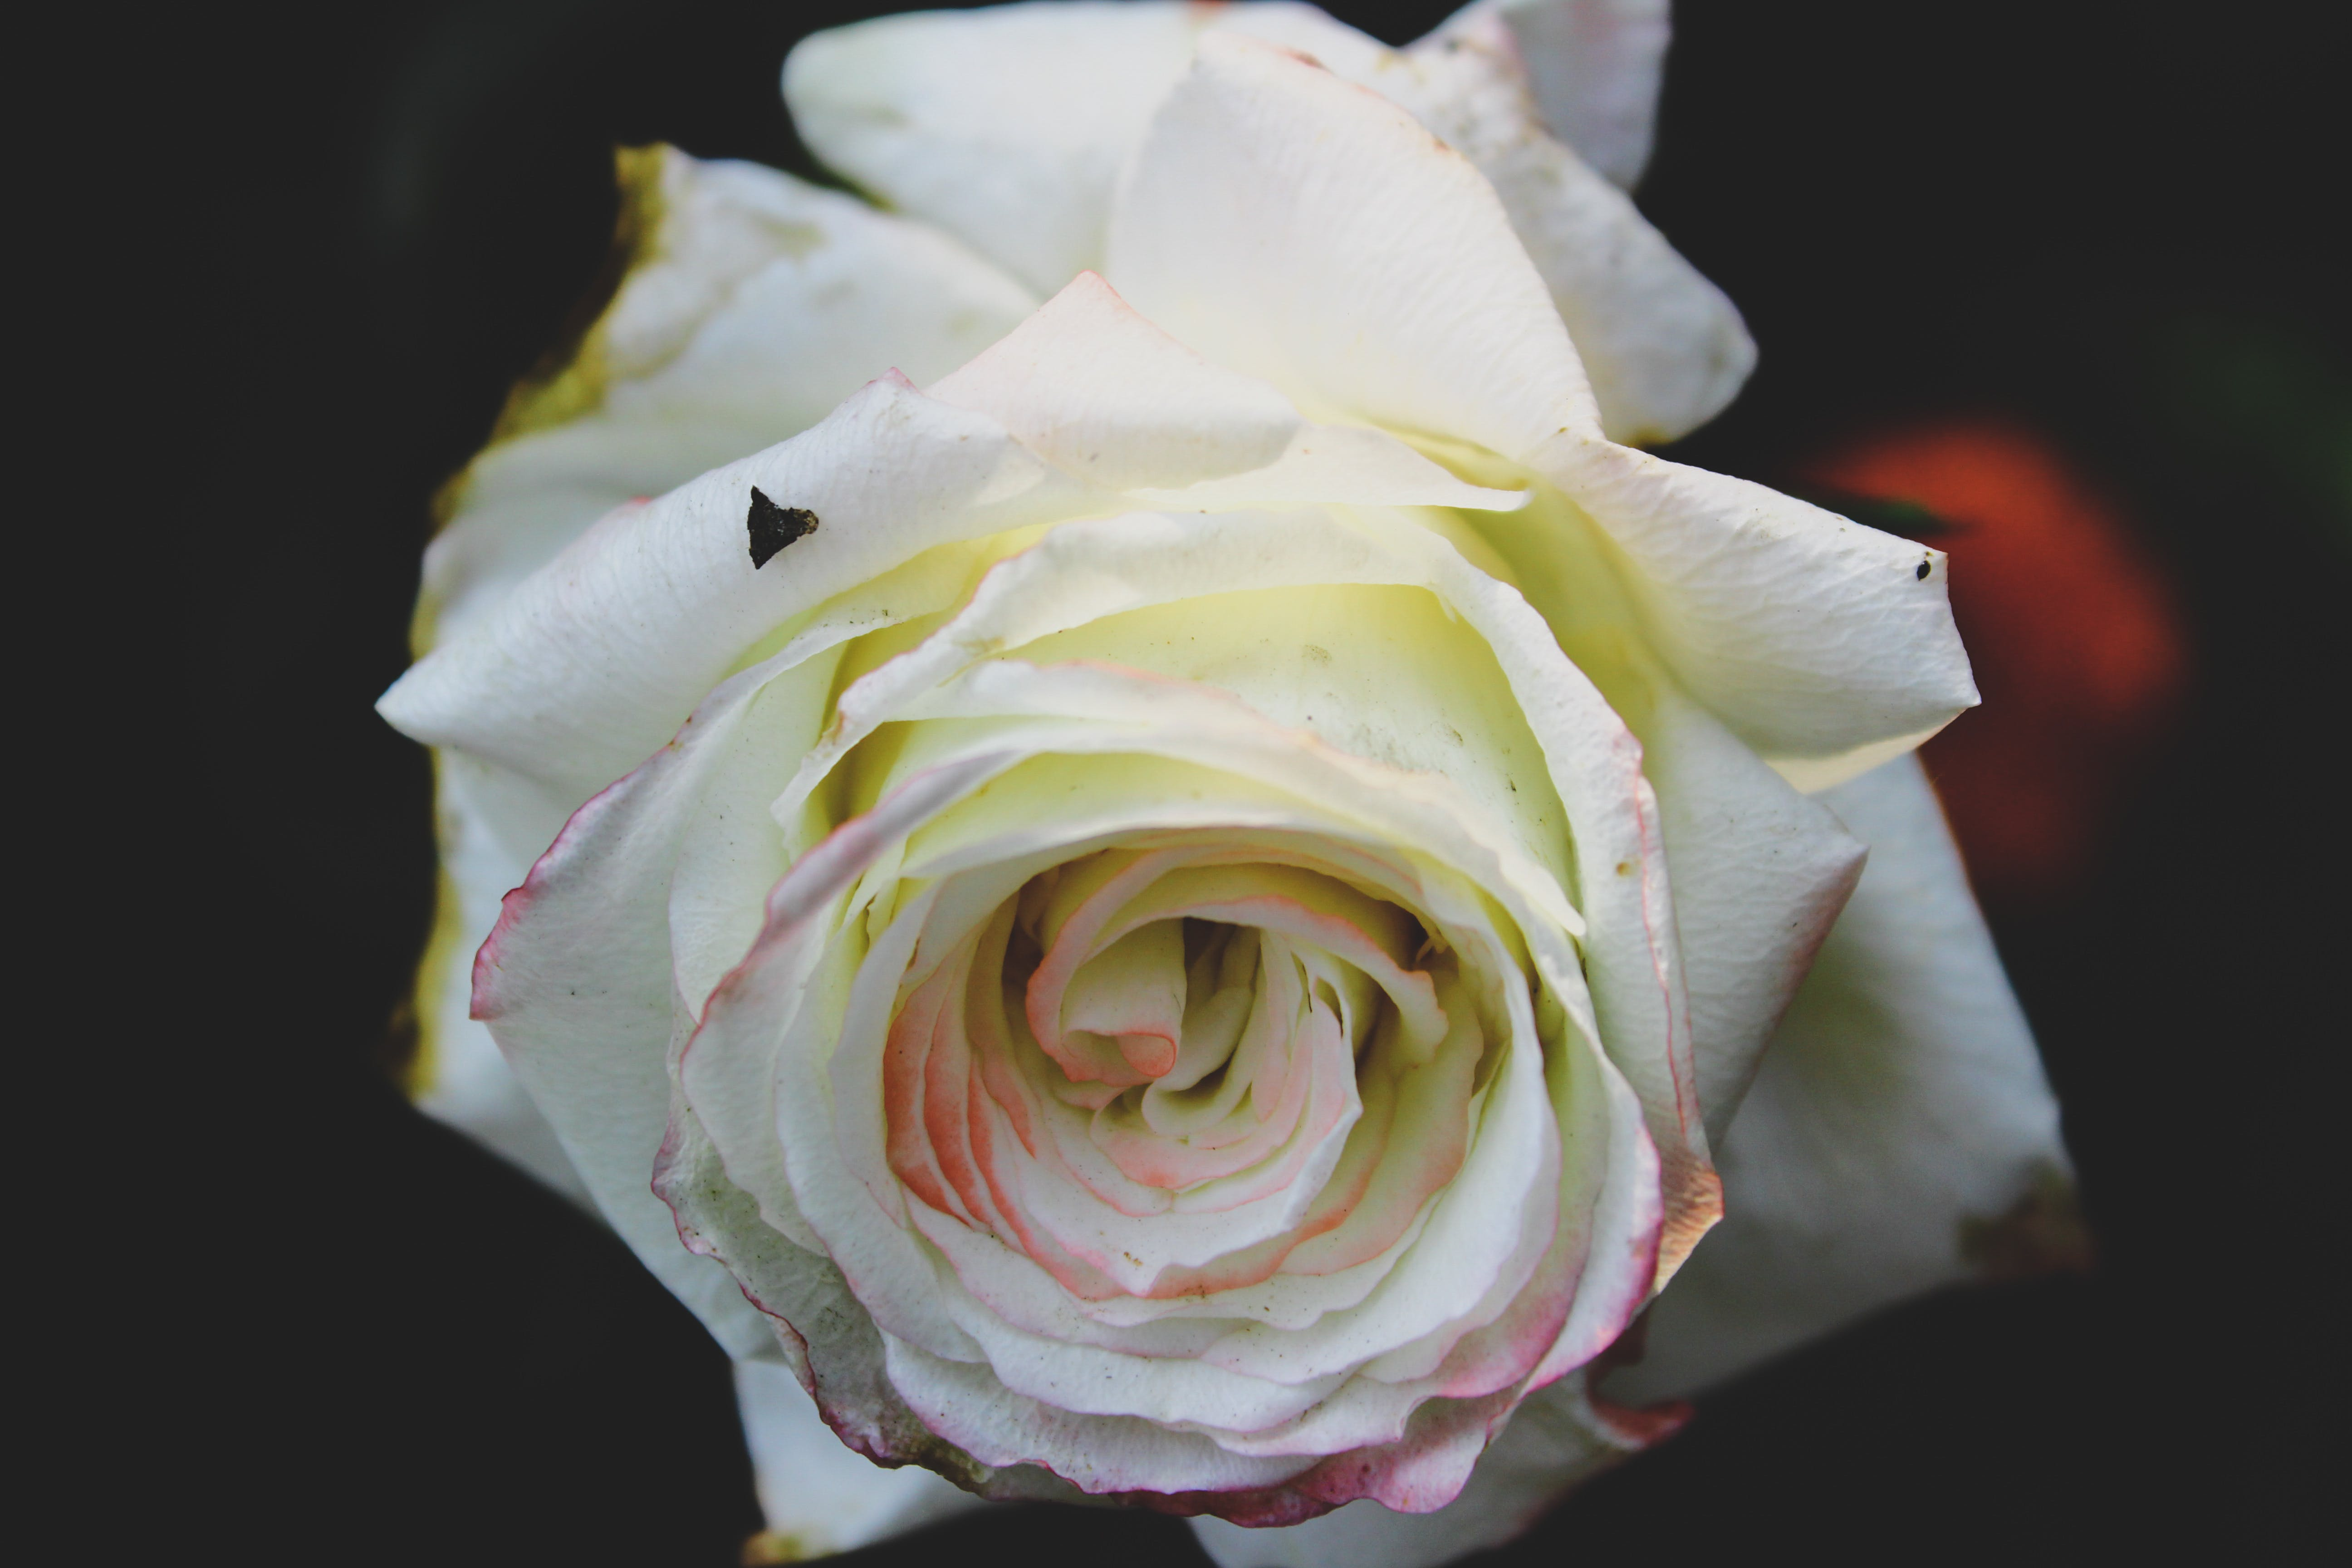 Closeup Photo of White Rose Flower